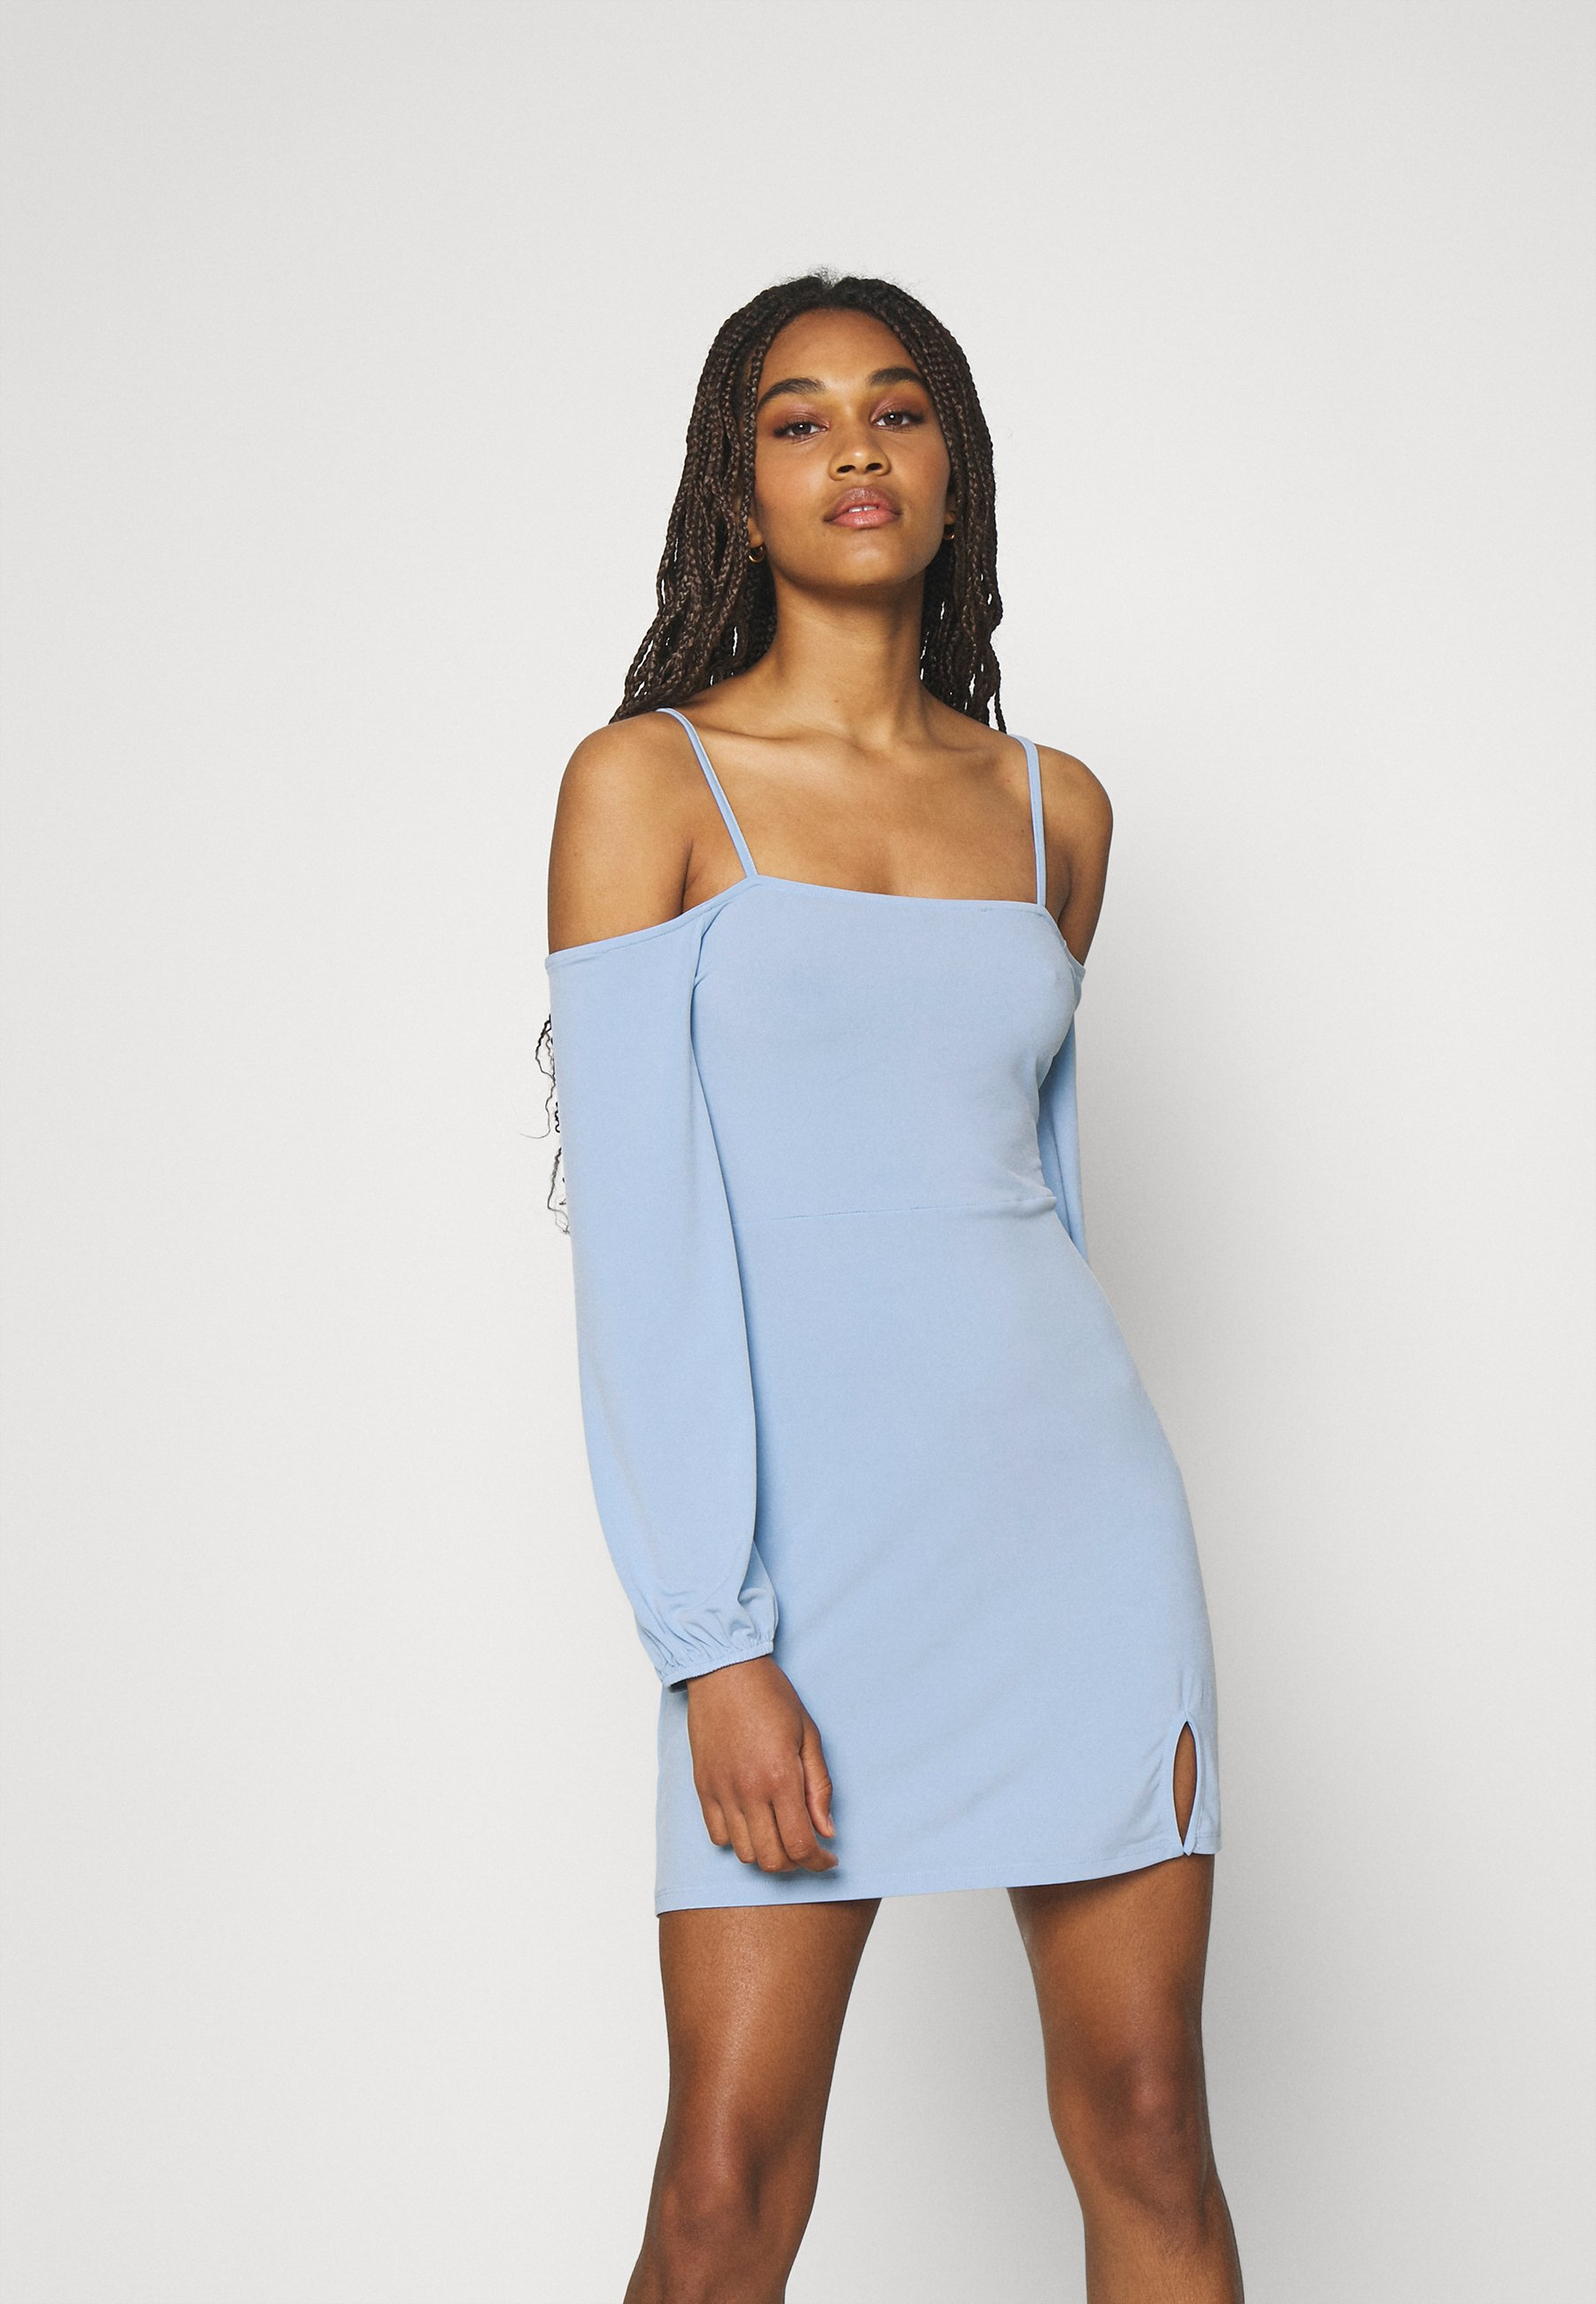 Women PAMELA REIF OFF SHOULDER MINI DRESS - Jersey dress